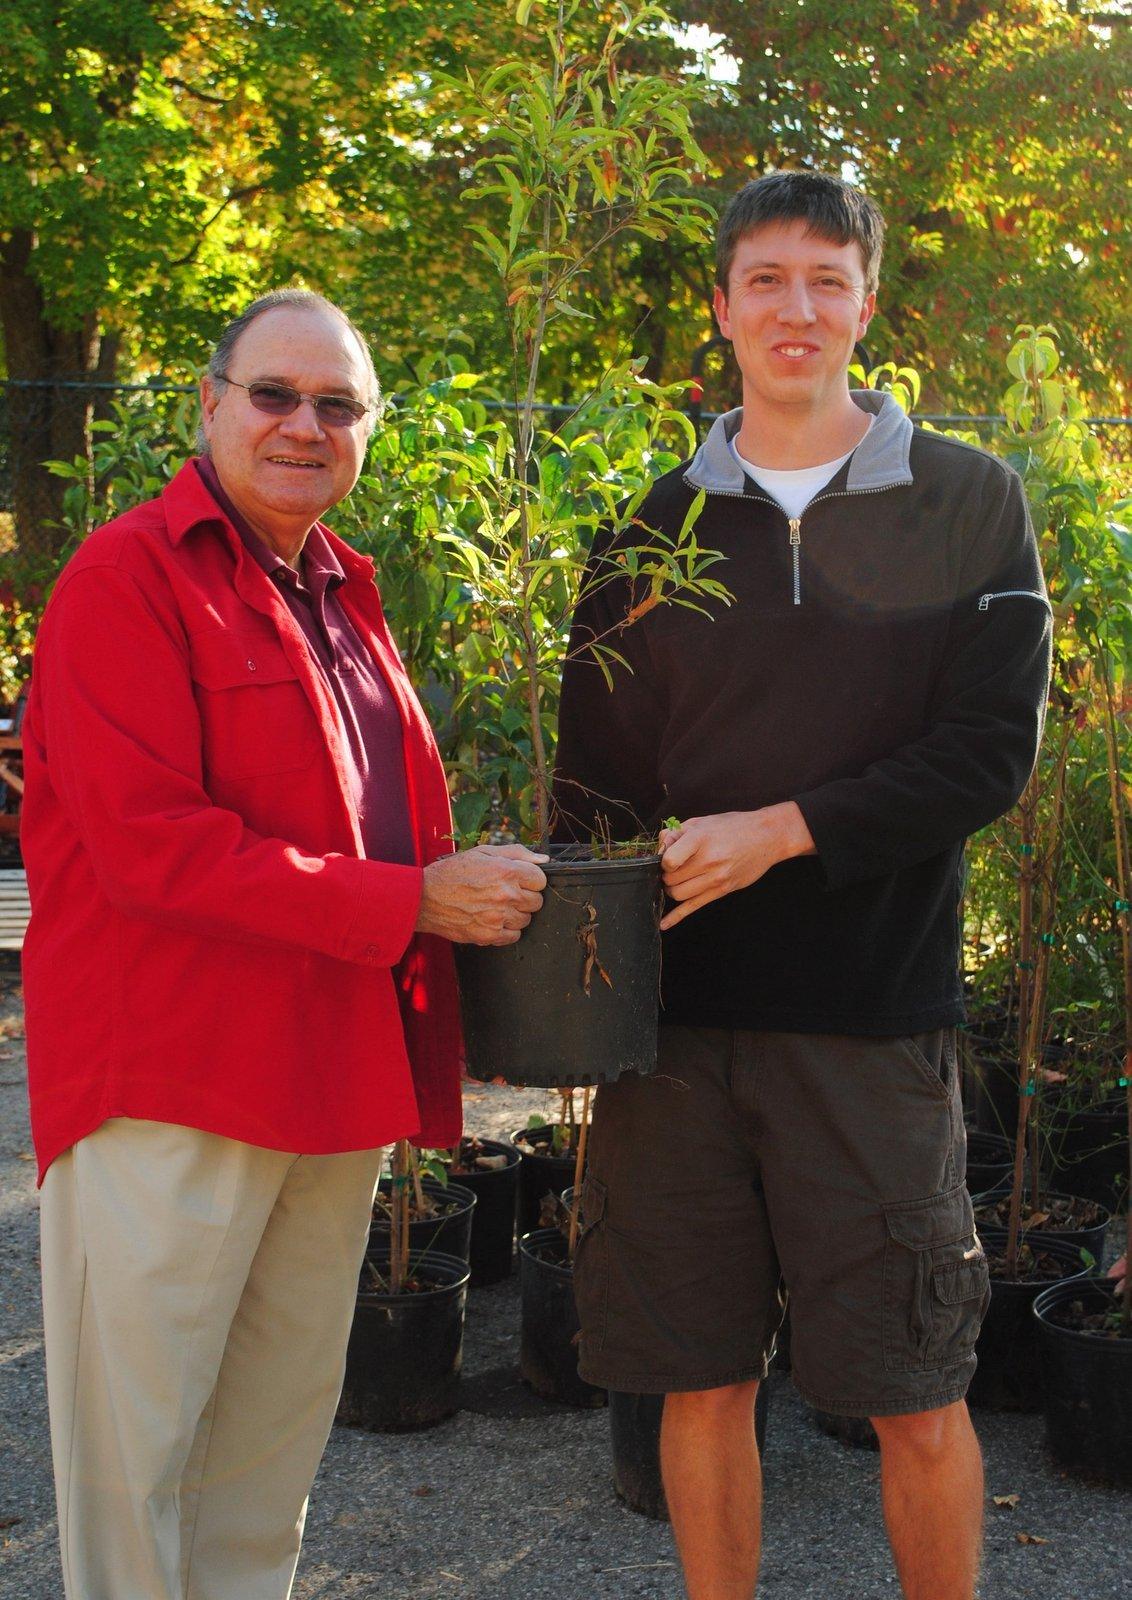 1ecc9a904193af4f111e_Union_County_Tree_Giveaway.jpg